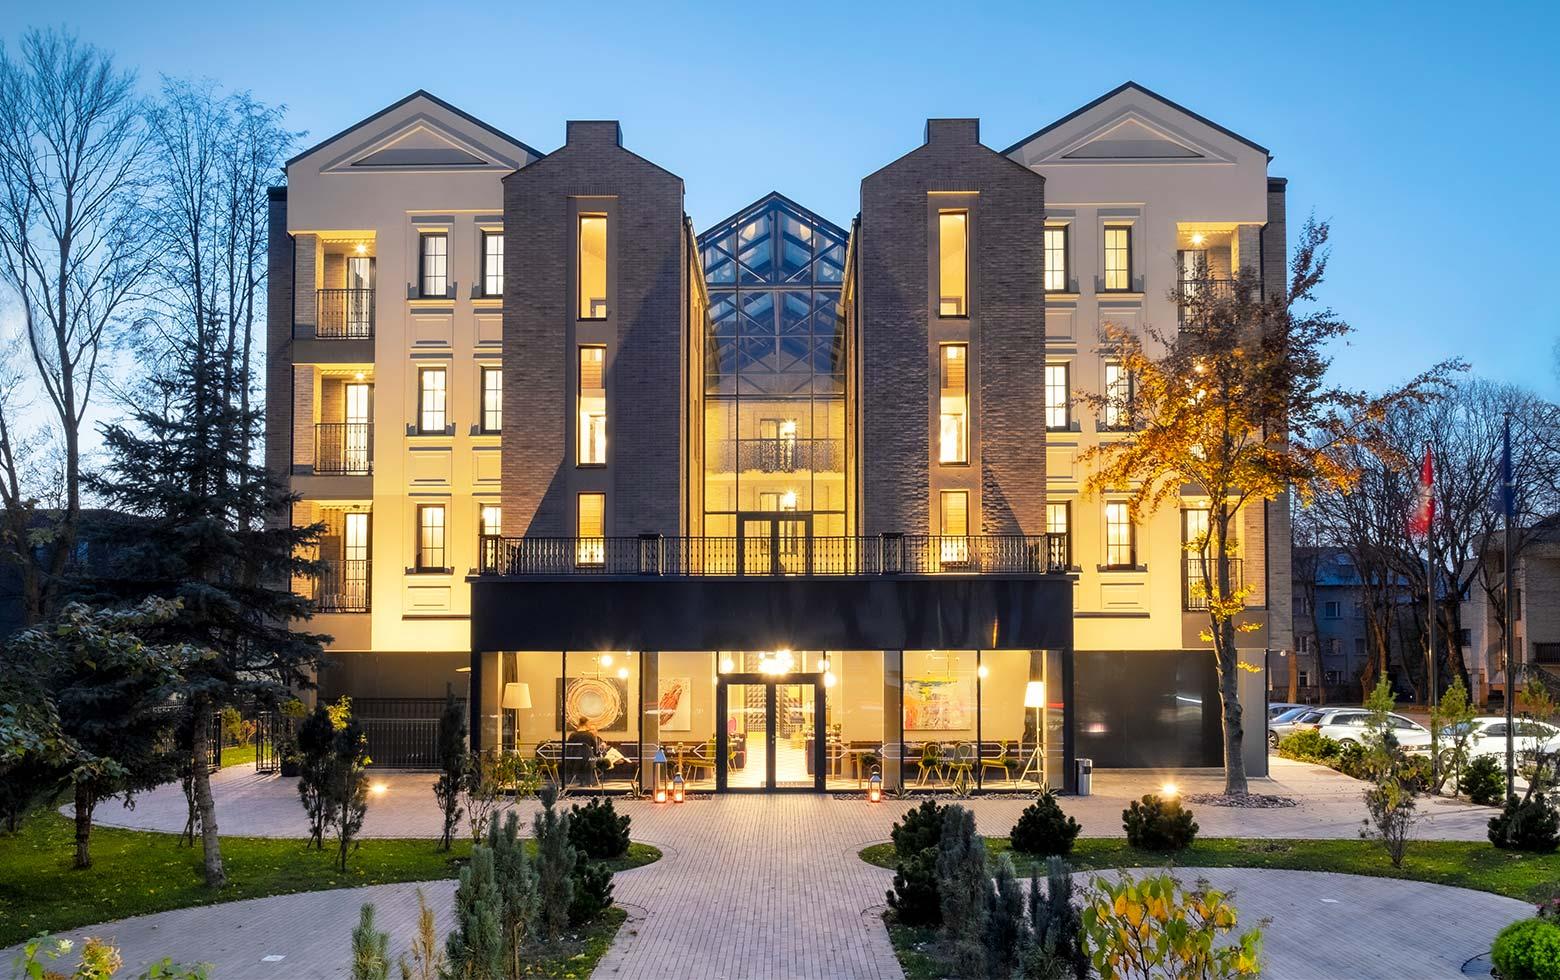 gospa-viesnica-amsterdam-plaza-exterior